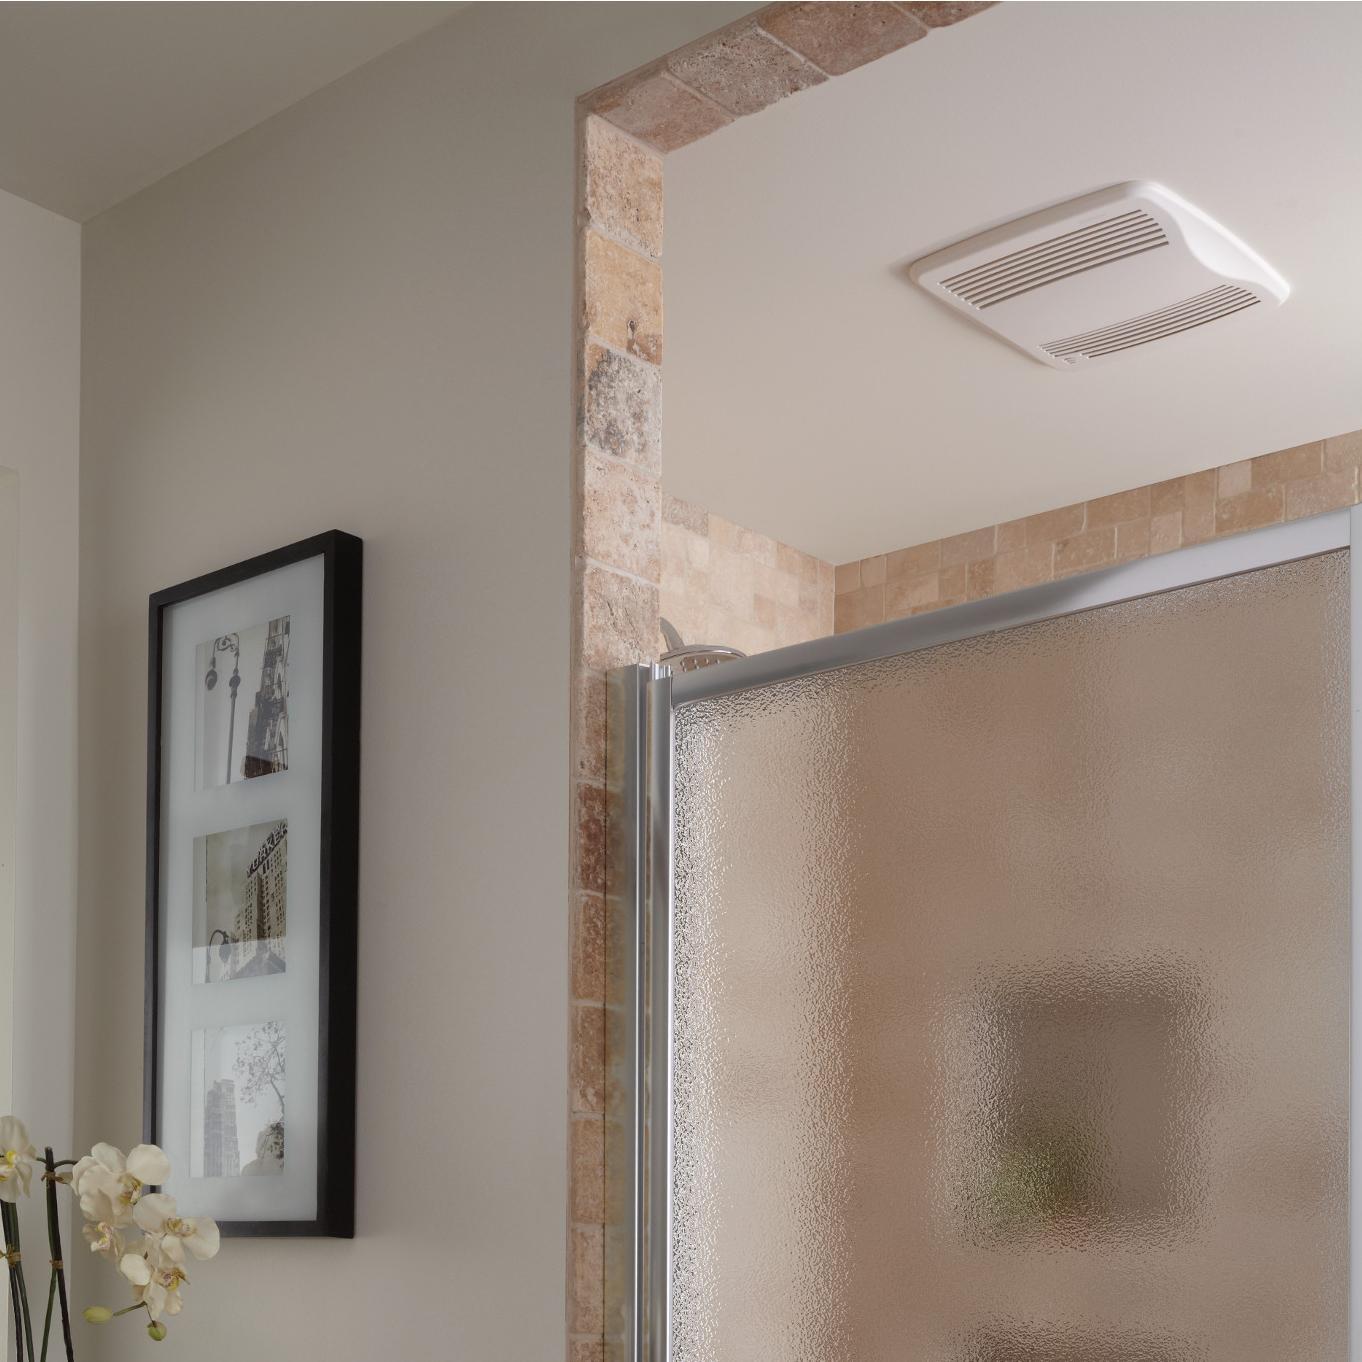 Broan QTXE110S Ultra Silent Humidity Sensing Auto On/Off Bath Fan